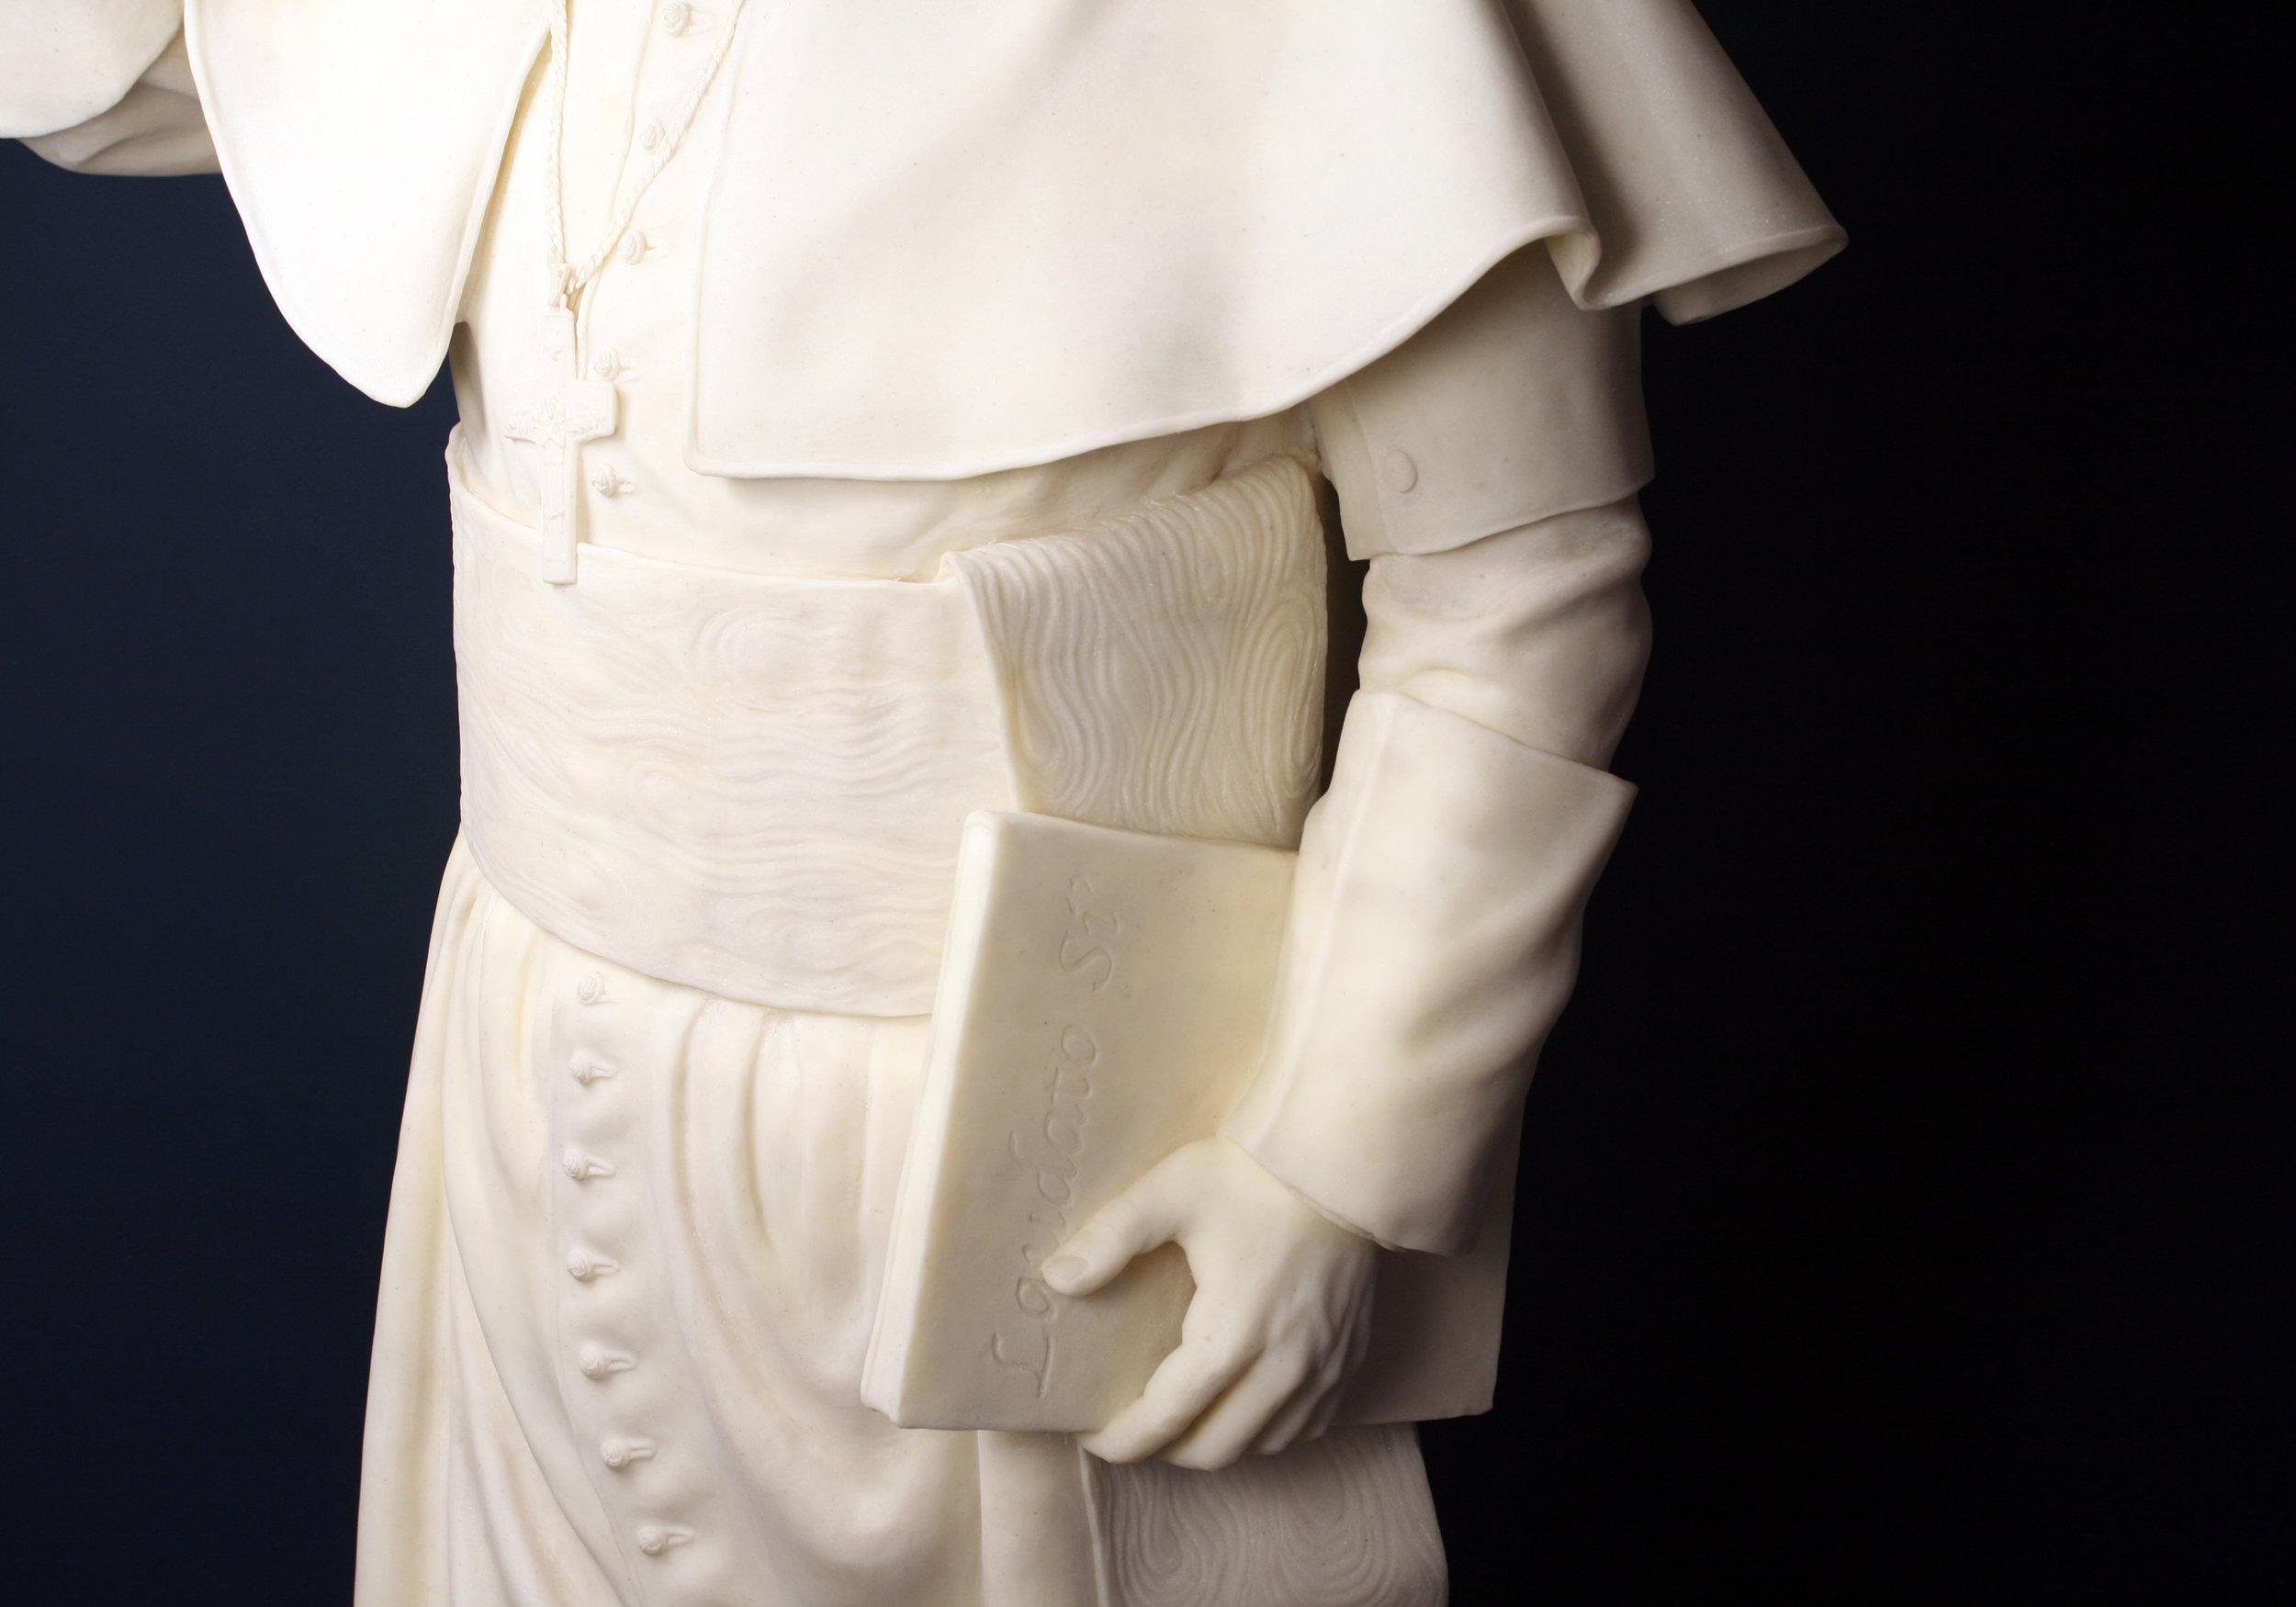 Pope_cast_detail_book.jpg